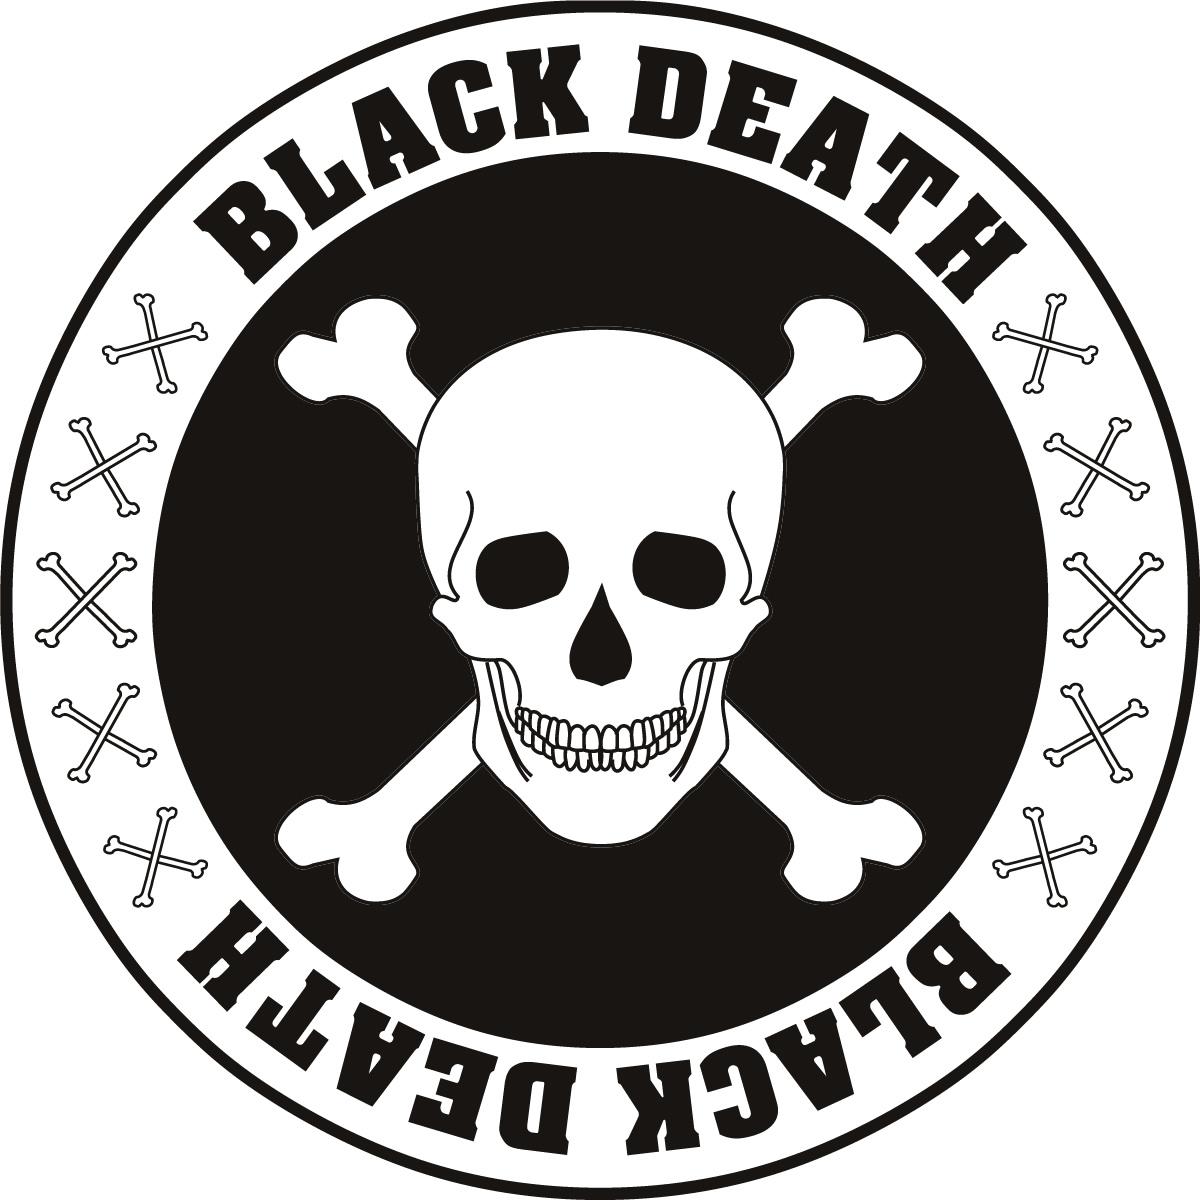 Free Black Death Cliparts, Download Free Clip Art, Free Clip.